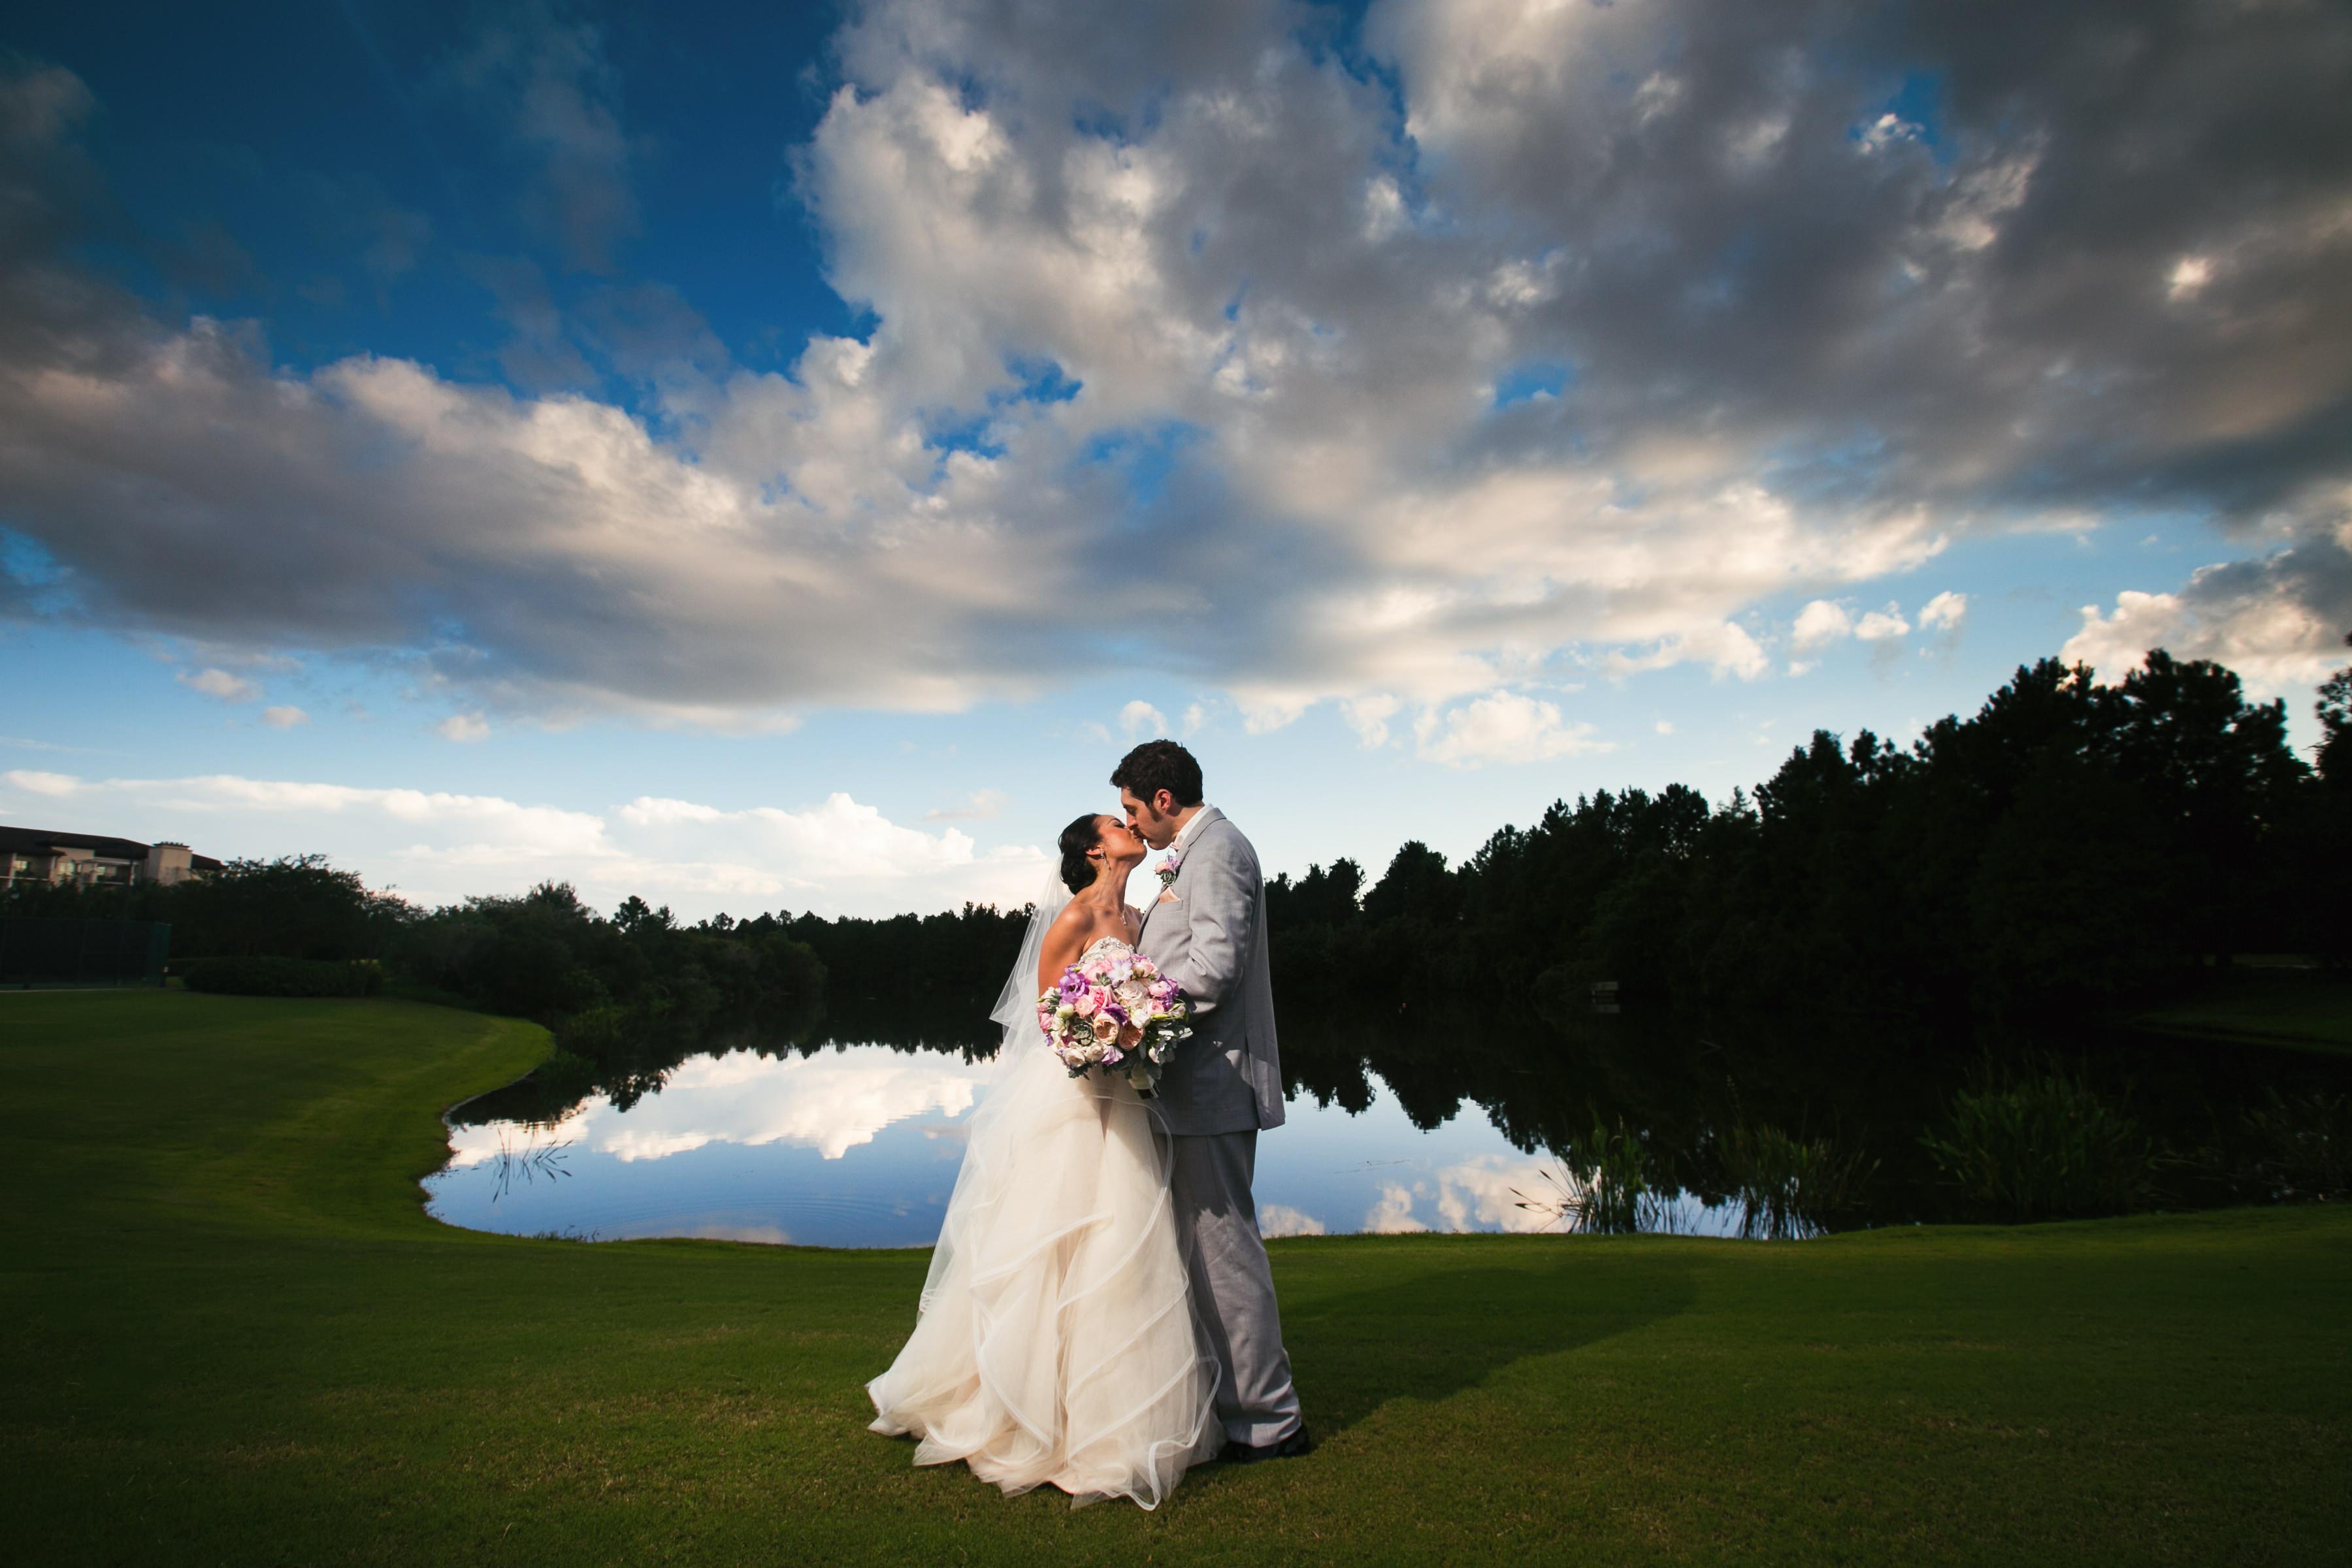 151010-Falcon-Wedding-4619-Edit